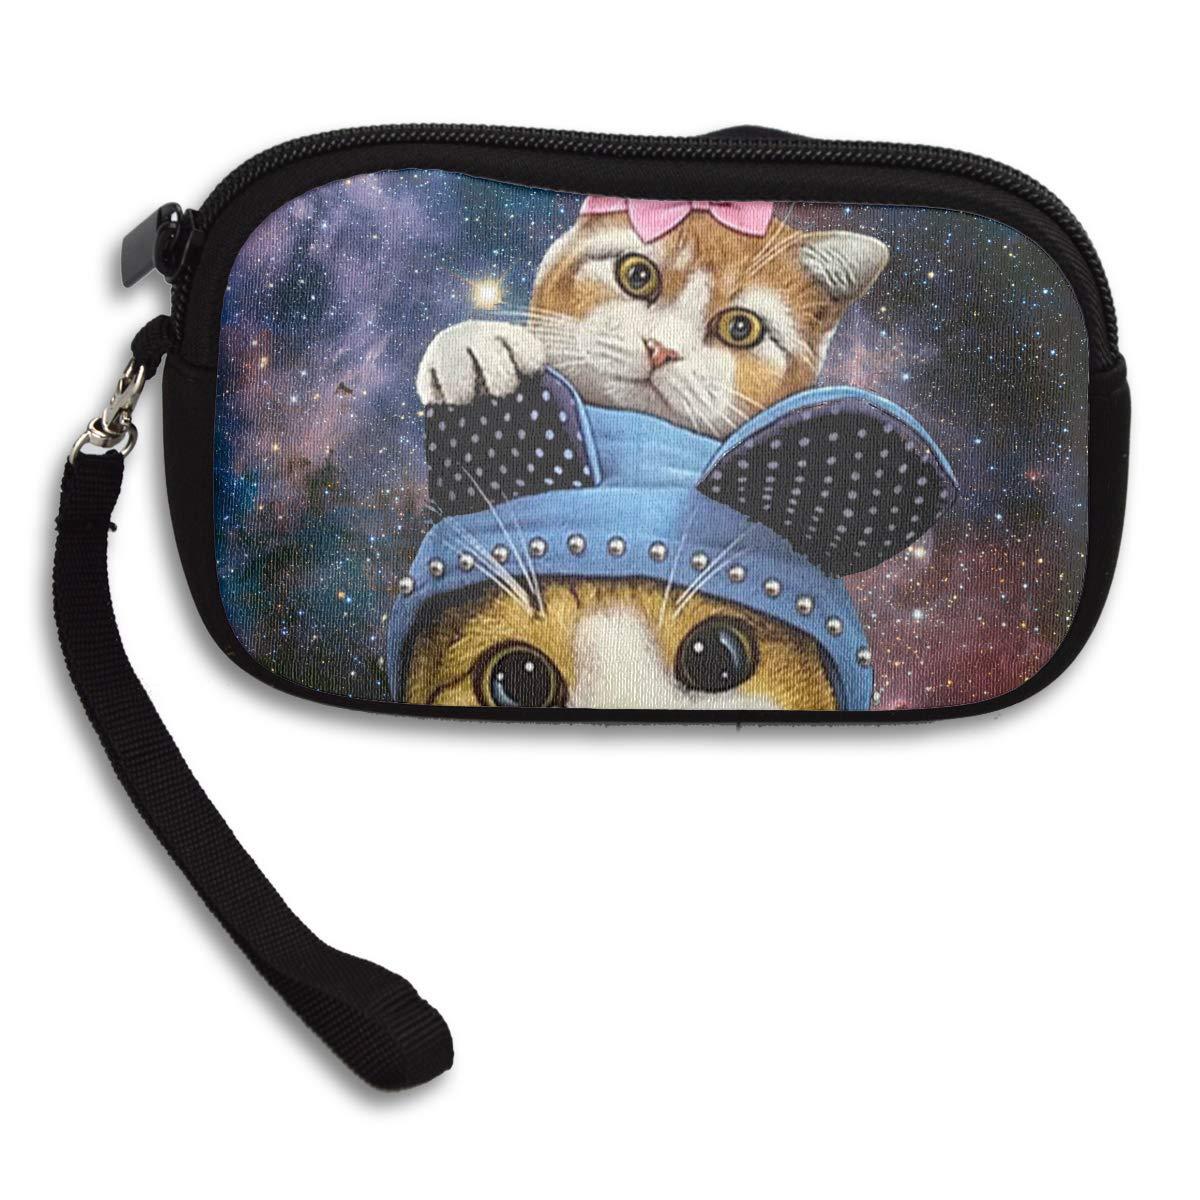 Funny Hats Twin Cat Galaxy Coin Pouch Clutch Purse Wristlet Wallet Phone Card Holder Handbag